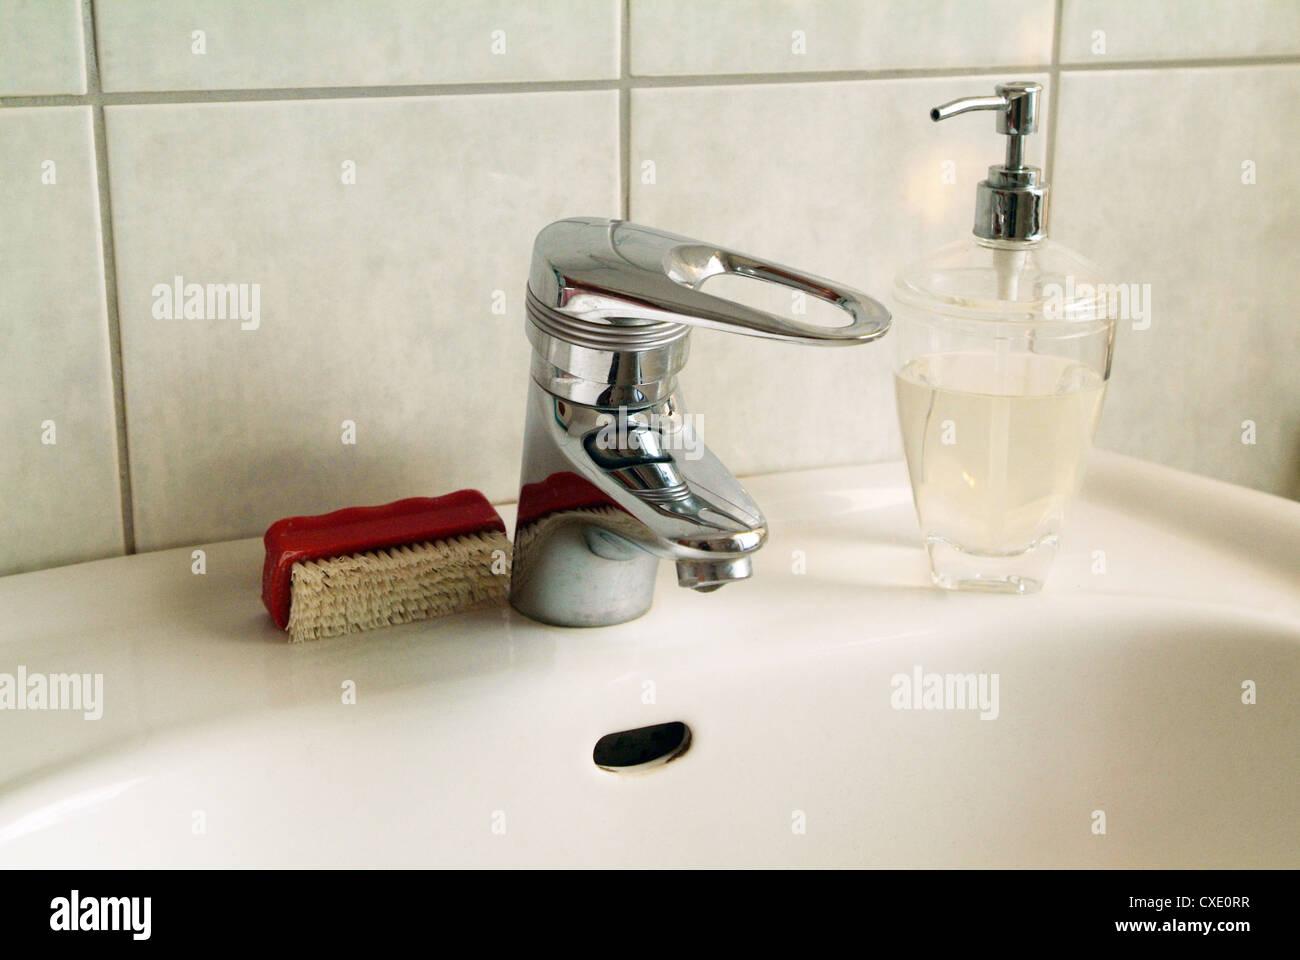 Hamburg sink in a bathroom Stock Photo